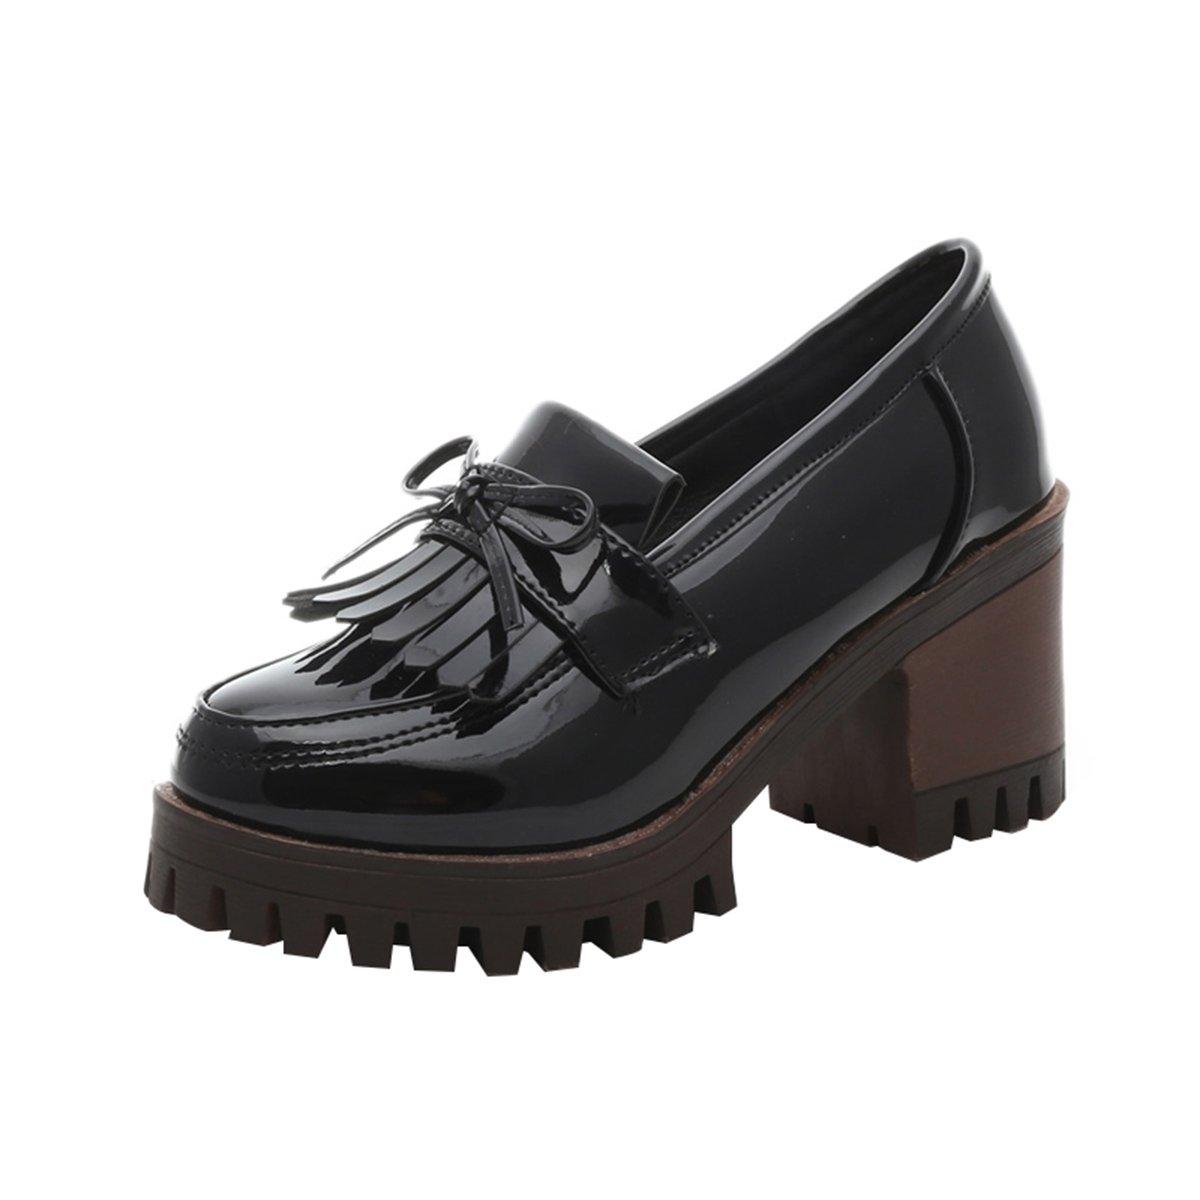 Dear Time Women Tassels Platform Mid Chunky Heels Oxfords Shoes by Black US 7.5